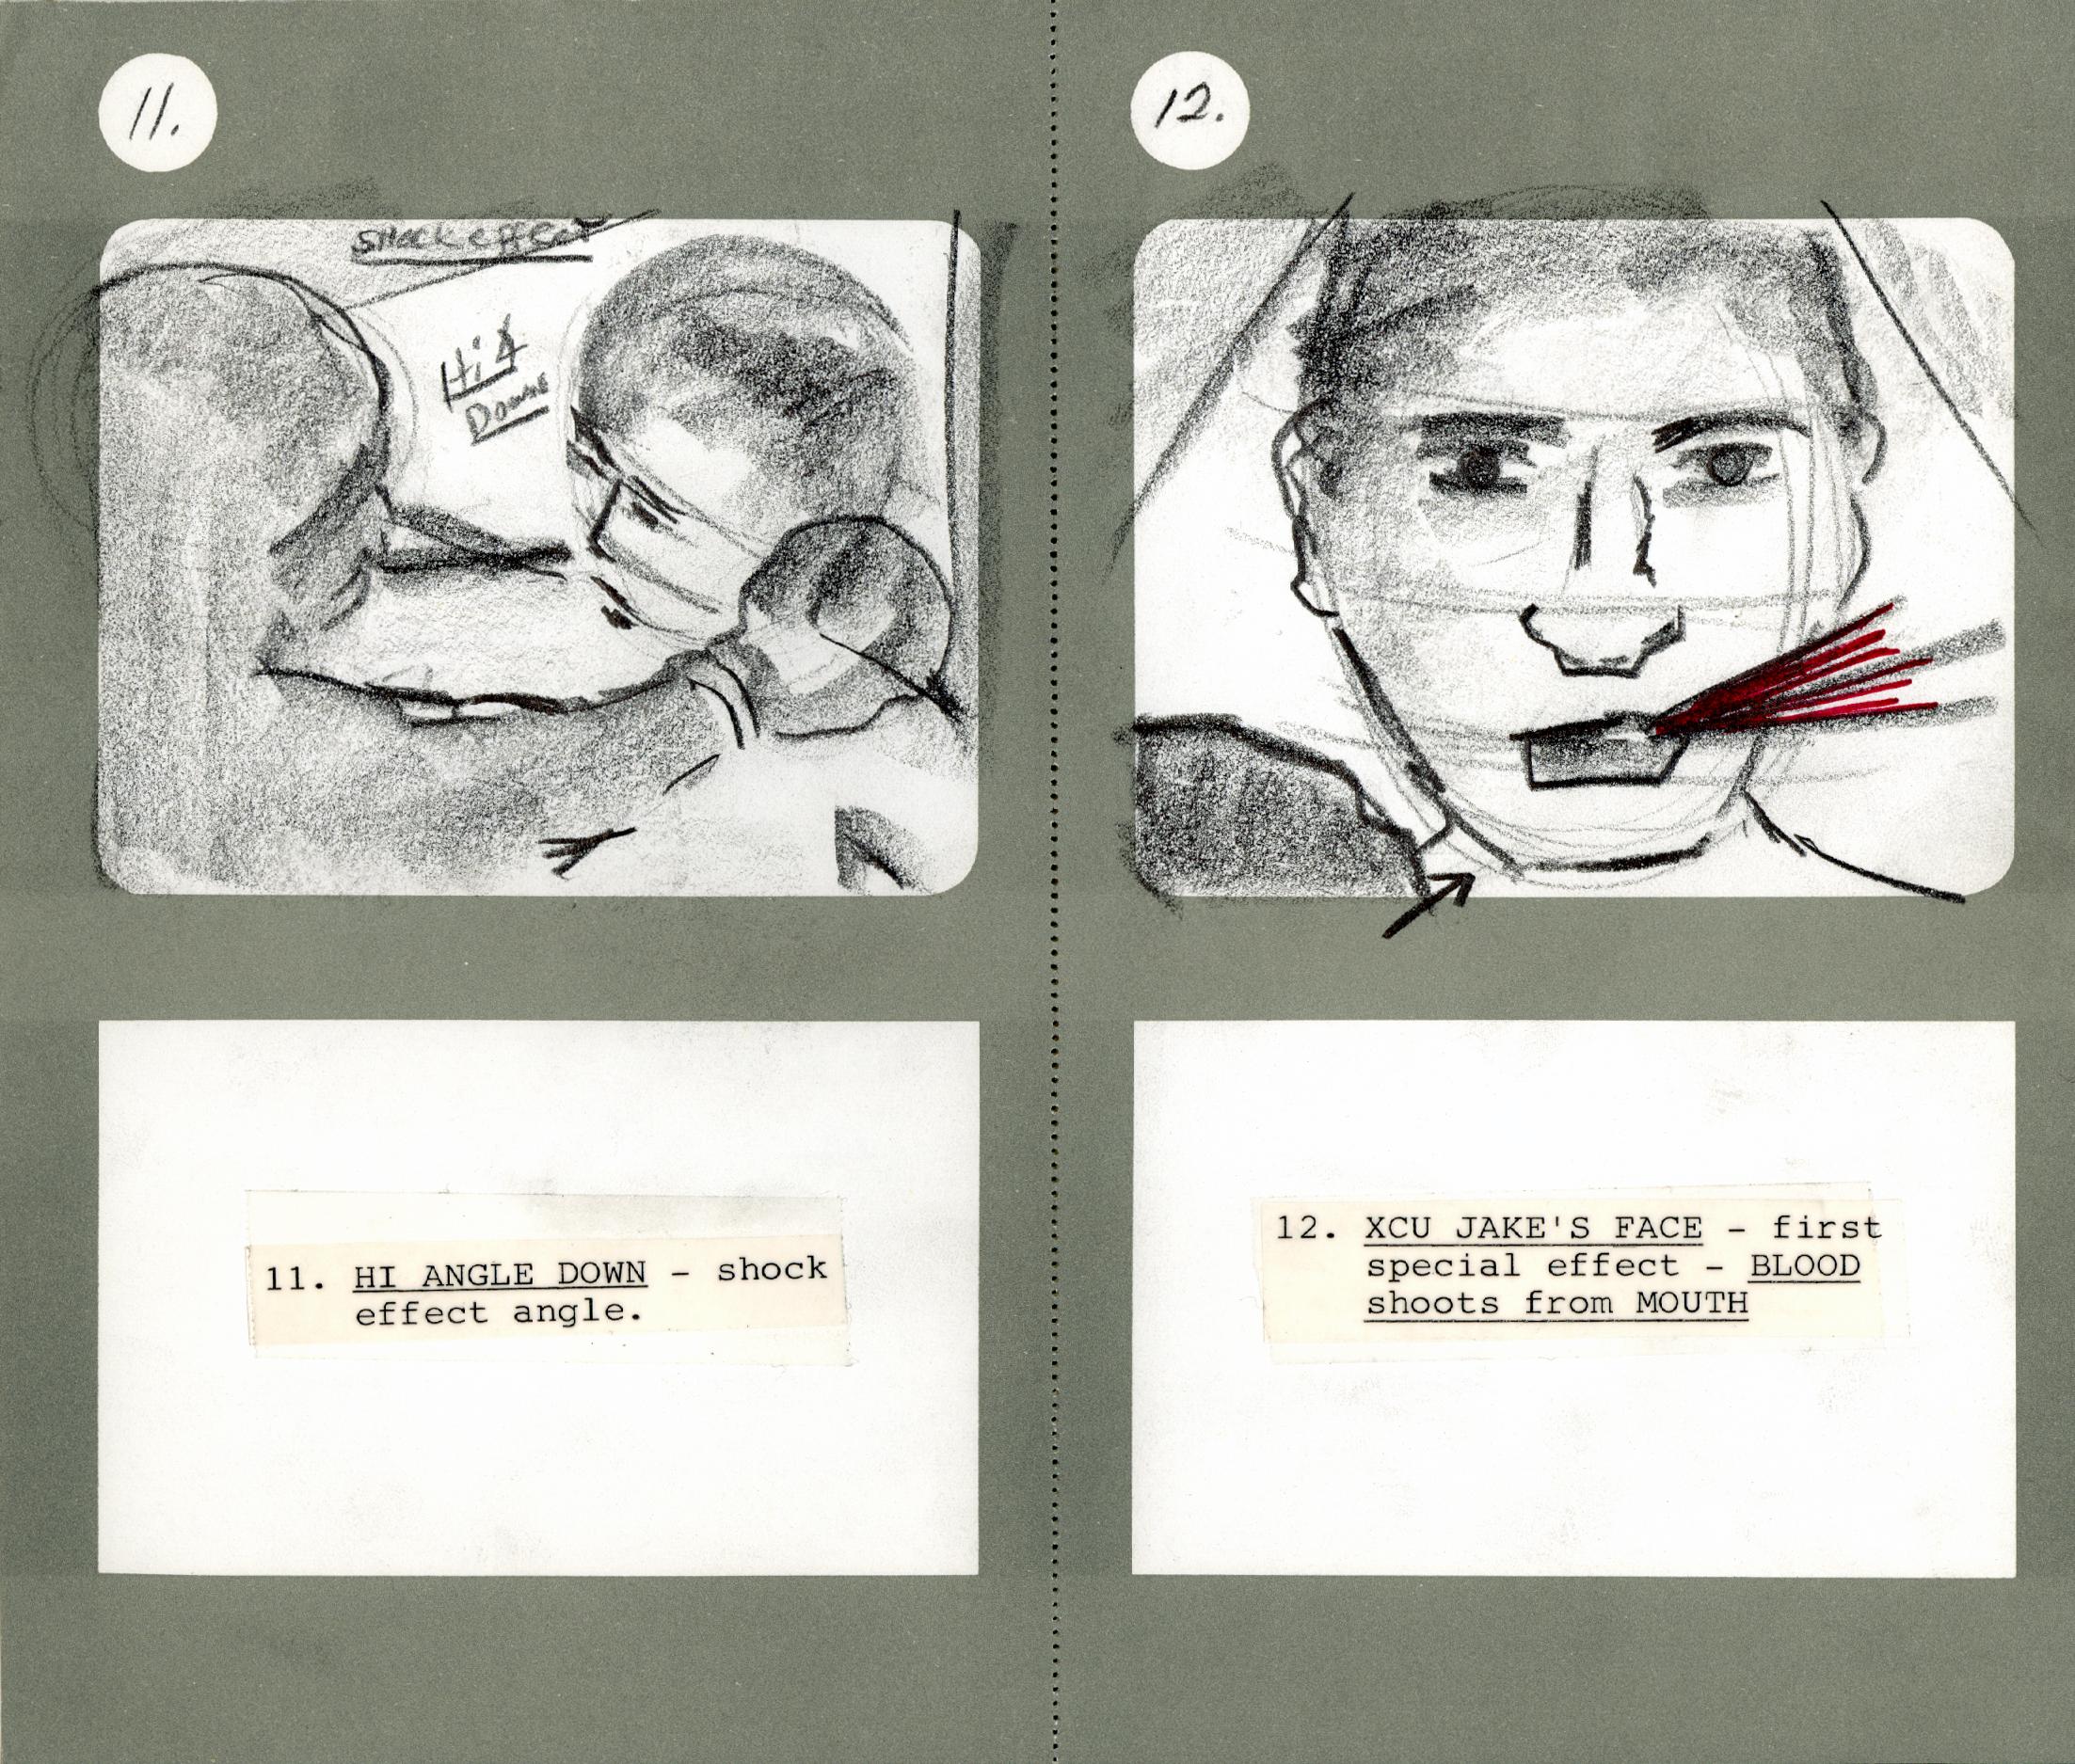 12_Scorsese_RB_storyboard_11_12.jpg